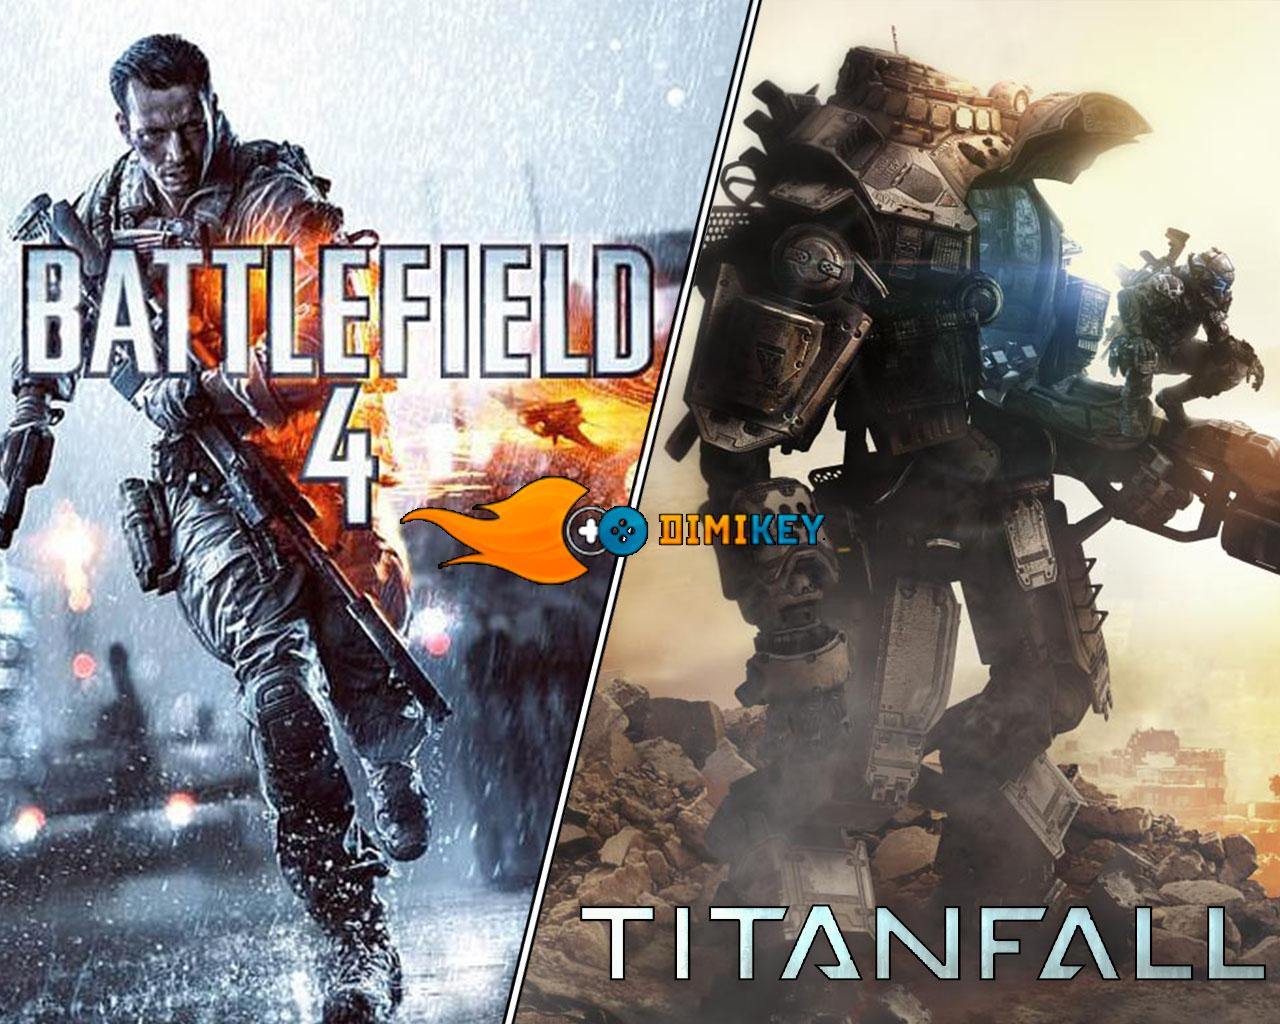 Titanfall + Battlefield 4 + почта [ORIGIN] + подарок